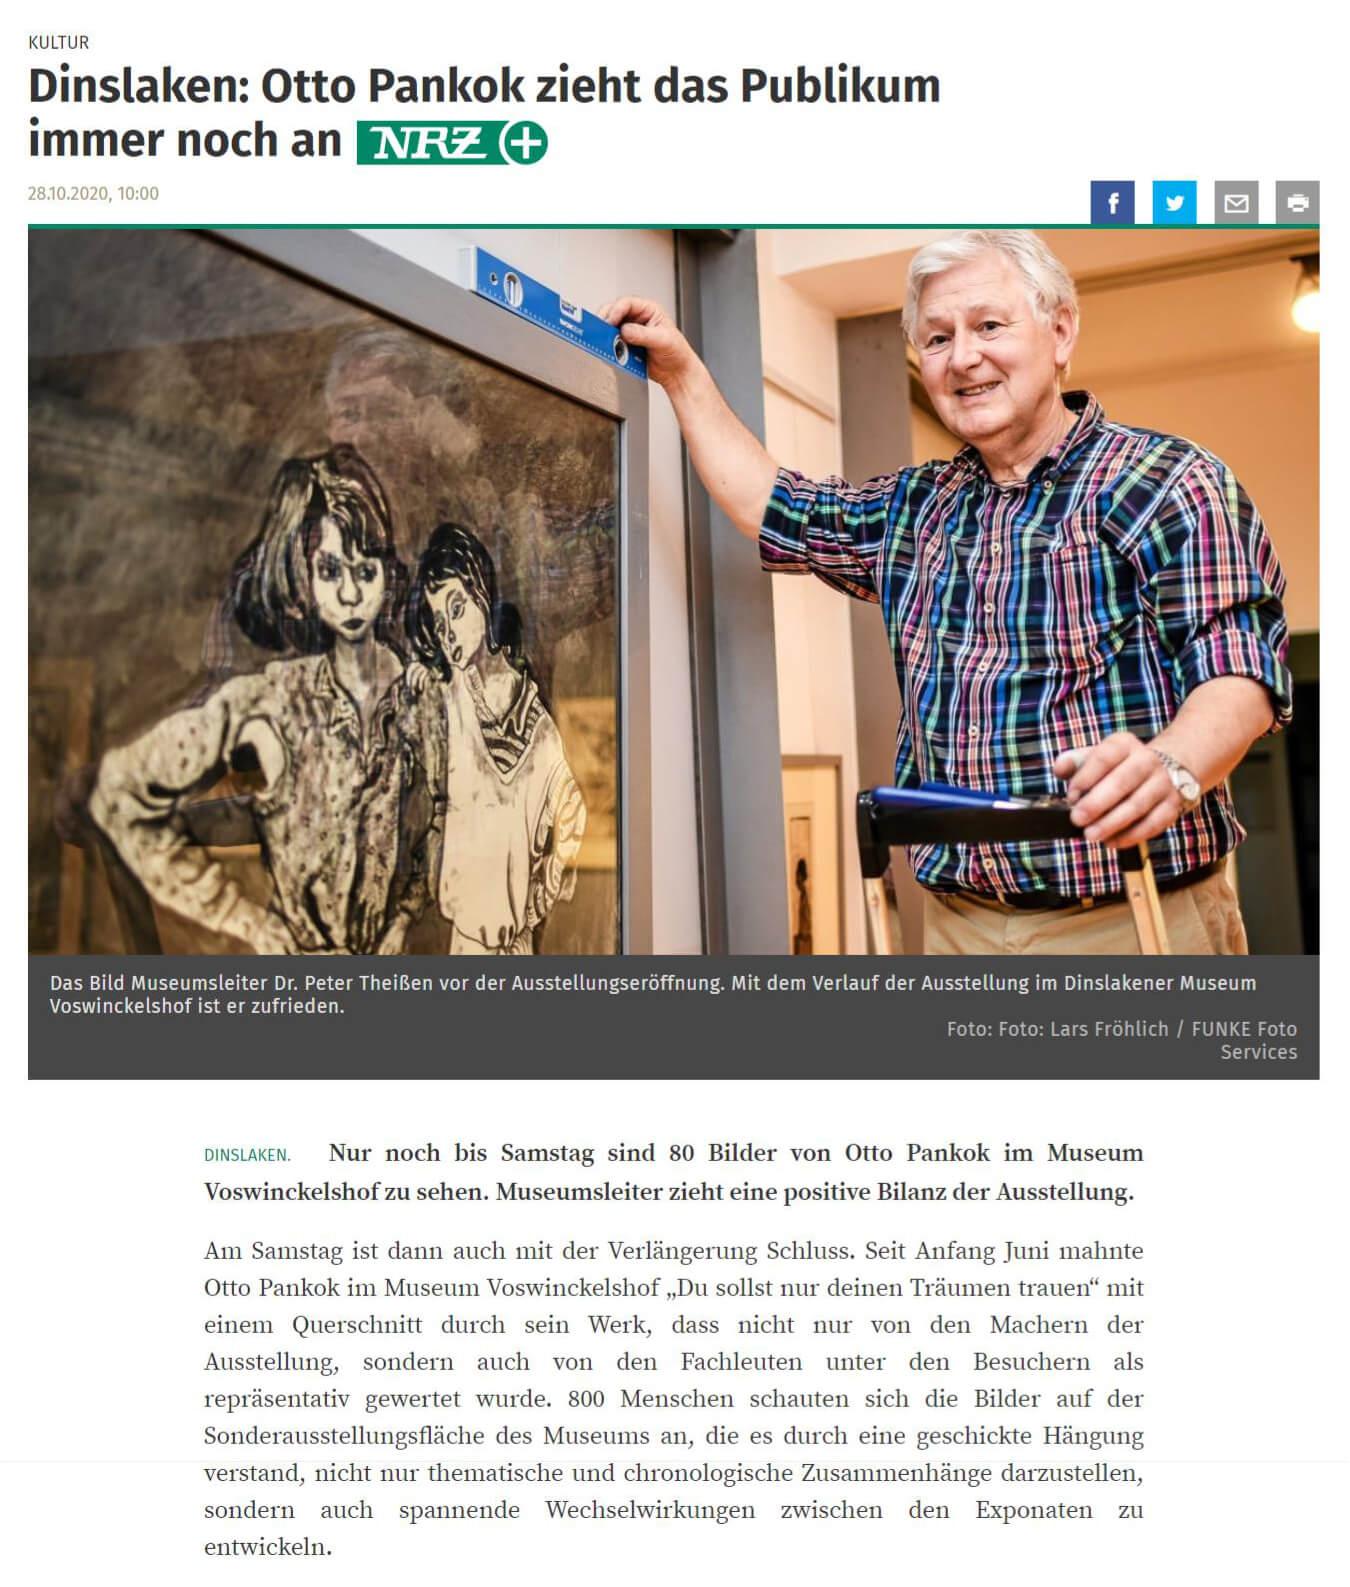 NRZ 28.10.2020 - Dinslaken - Otto Pankok zieht das Publikum immer noch an - Teil 1